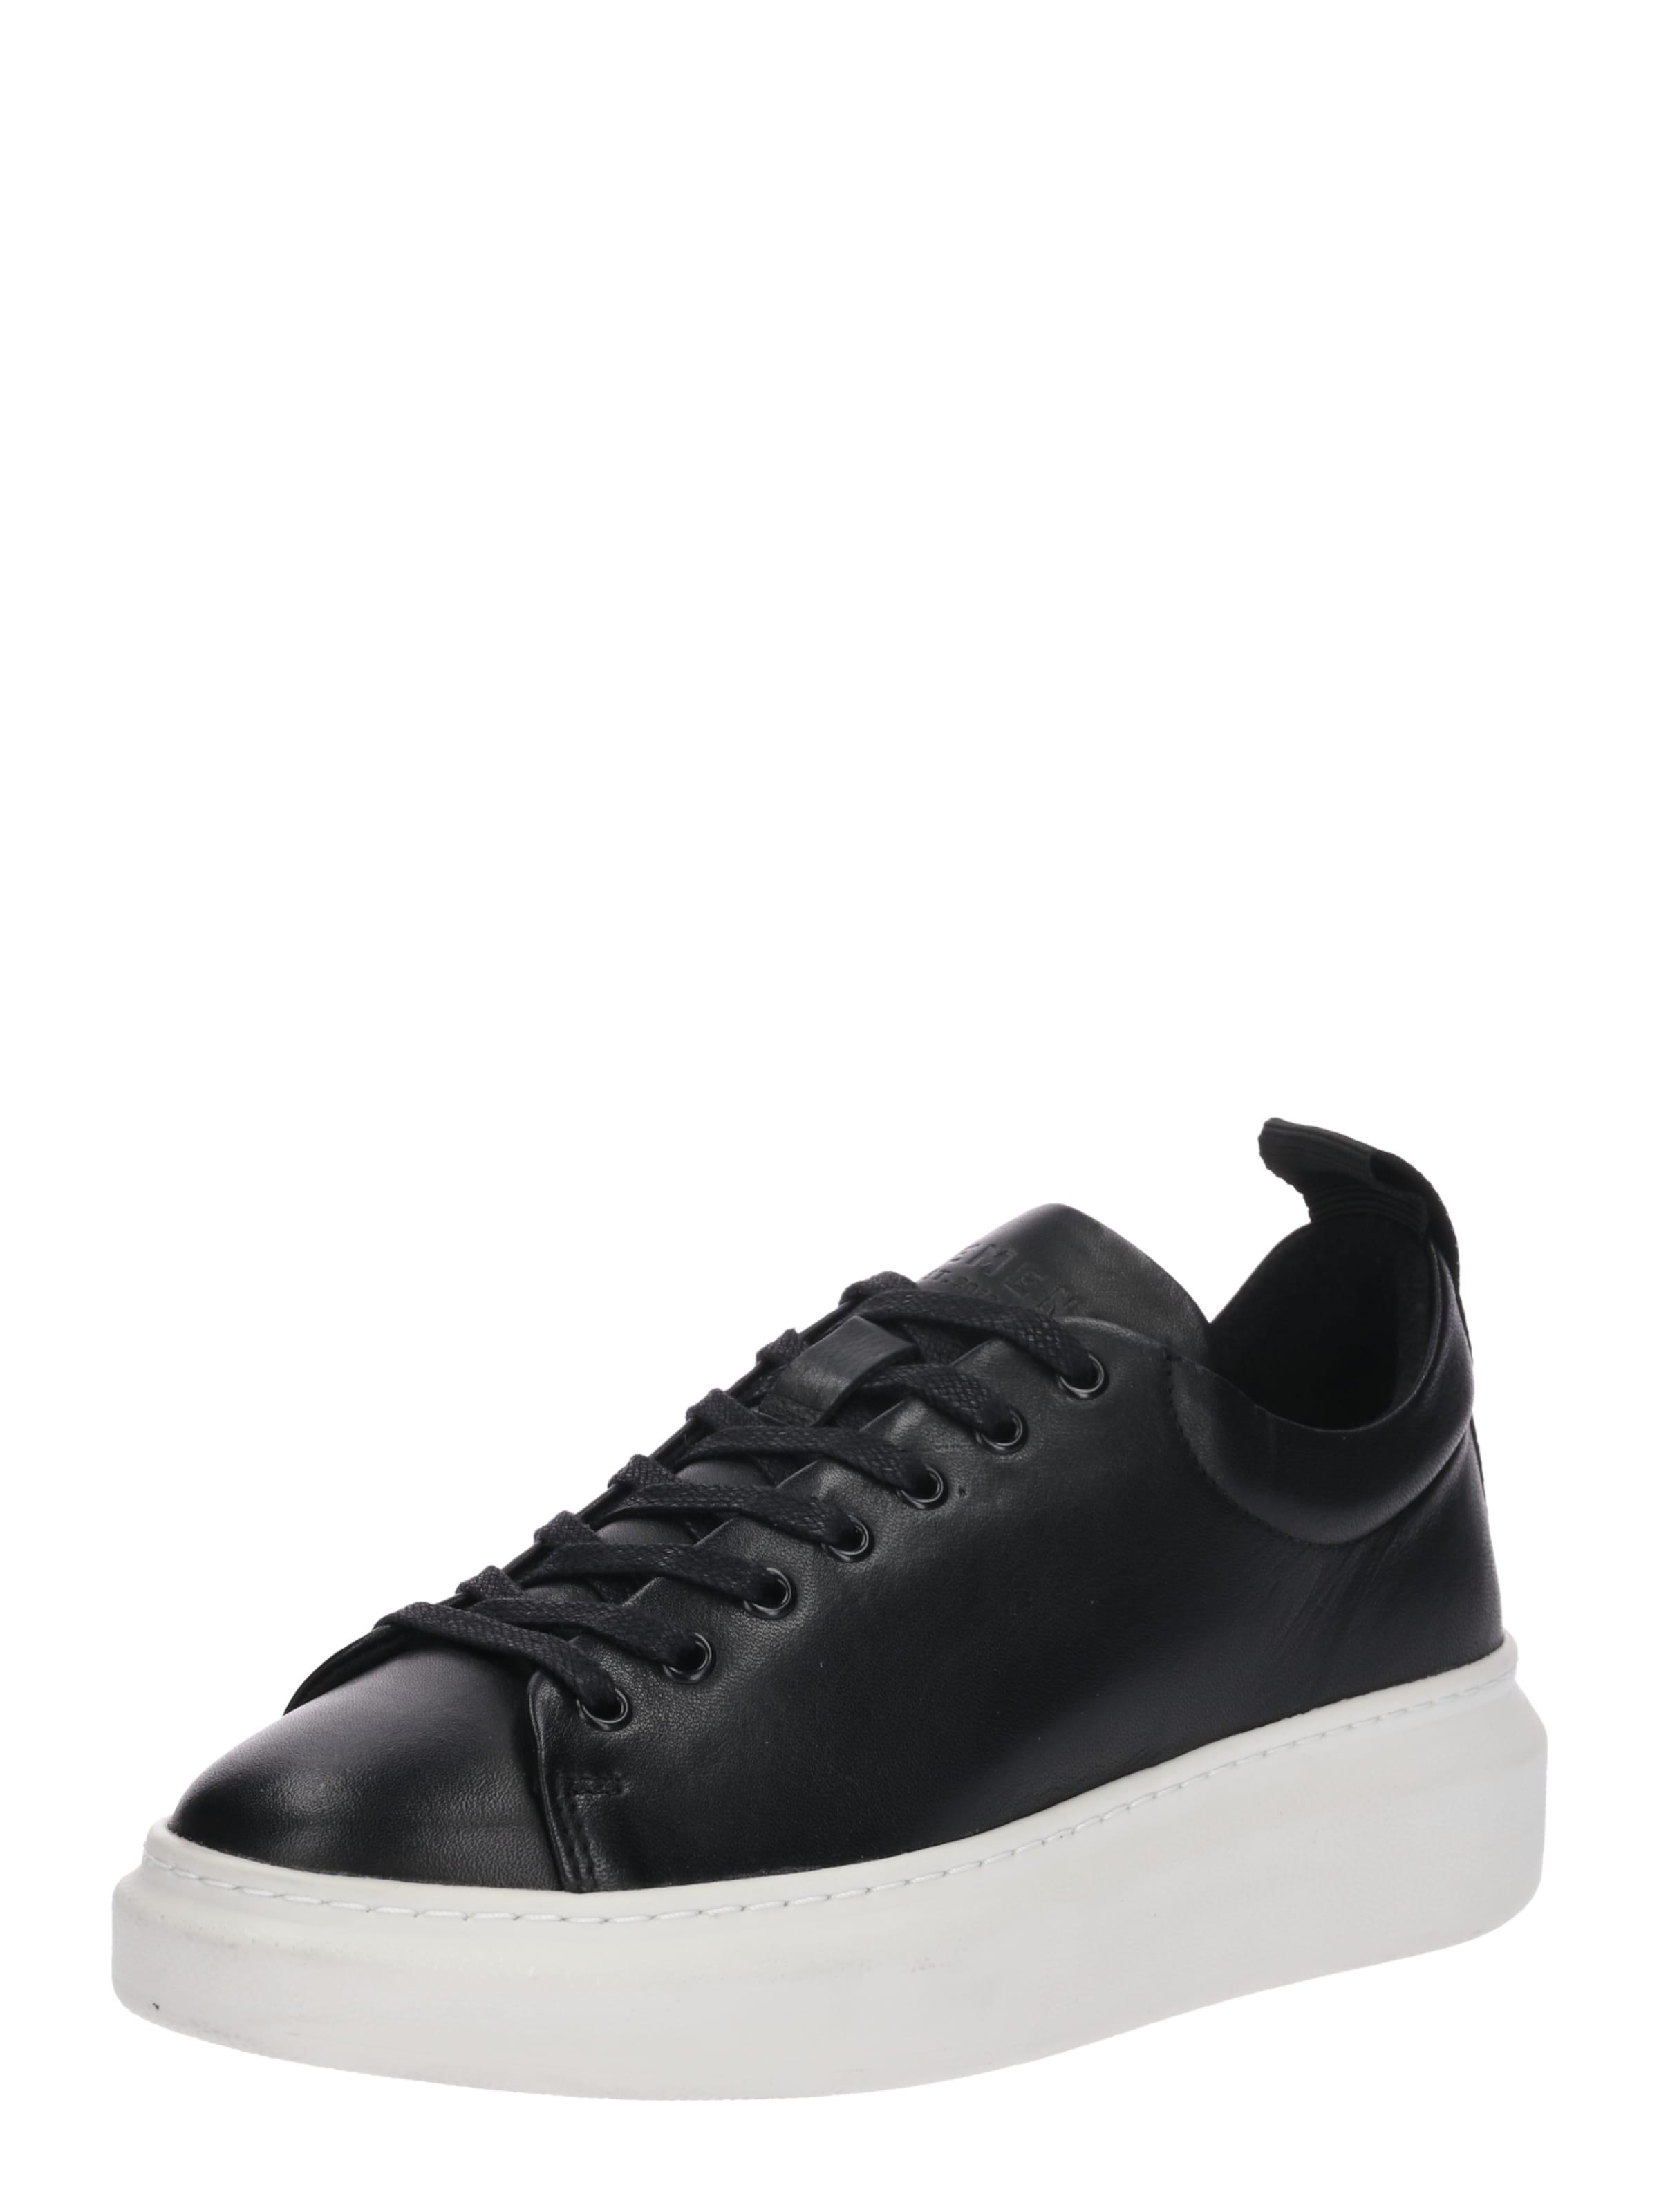 PAVEMENT Sneaker Dee Verschleißfeste billige Schuhe